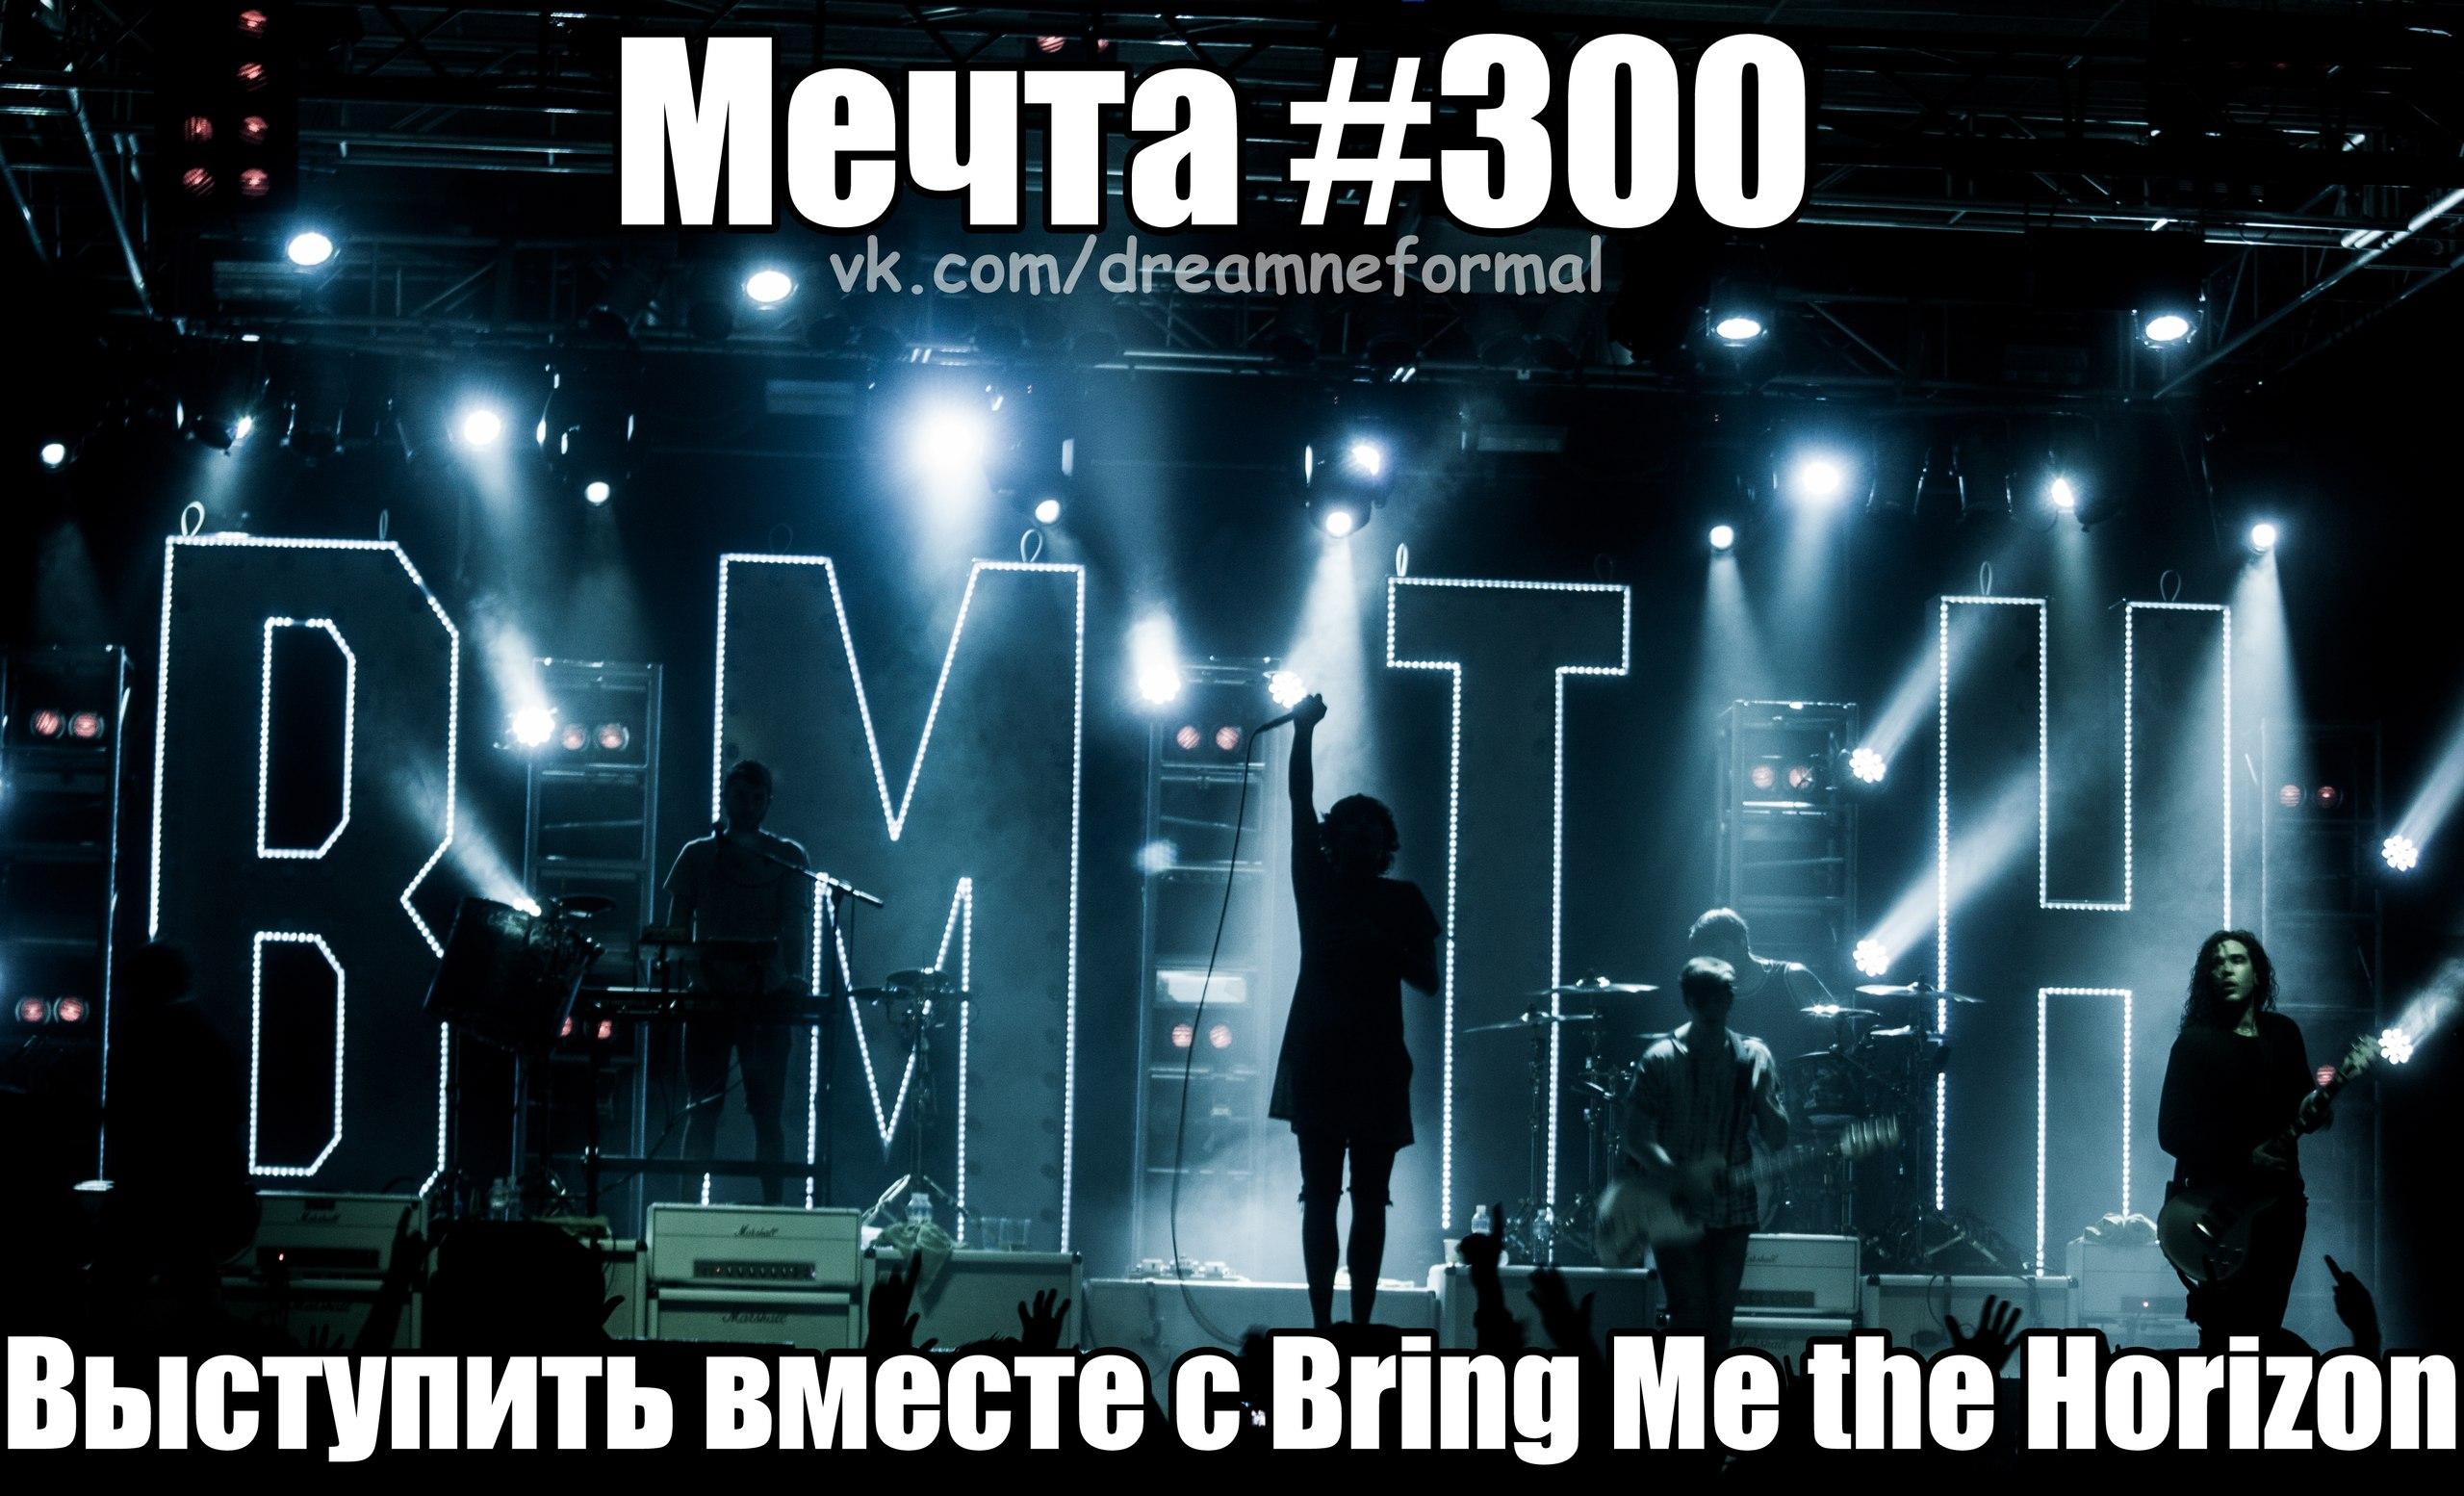 Фото с московского концерта бринг ми зе хоризон 6